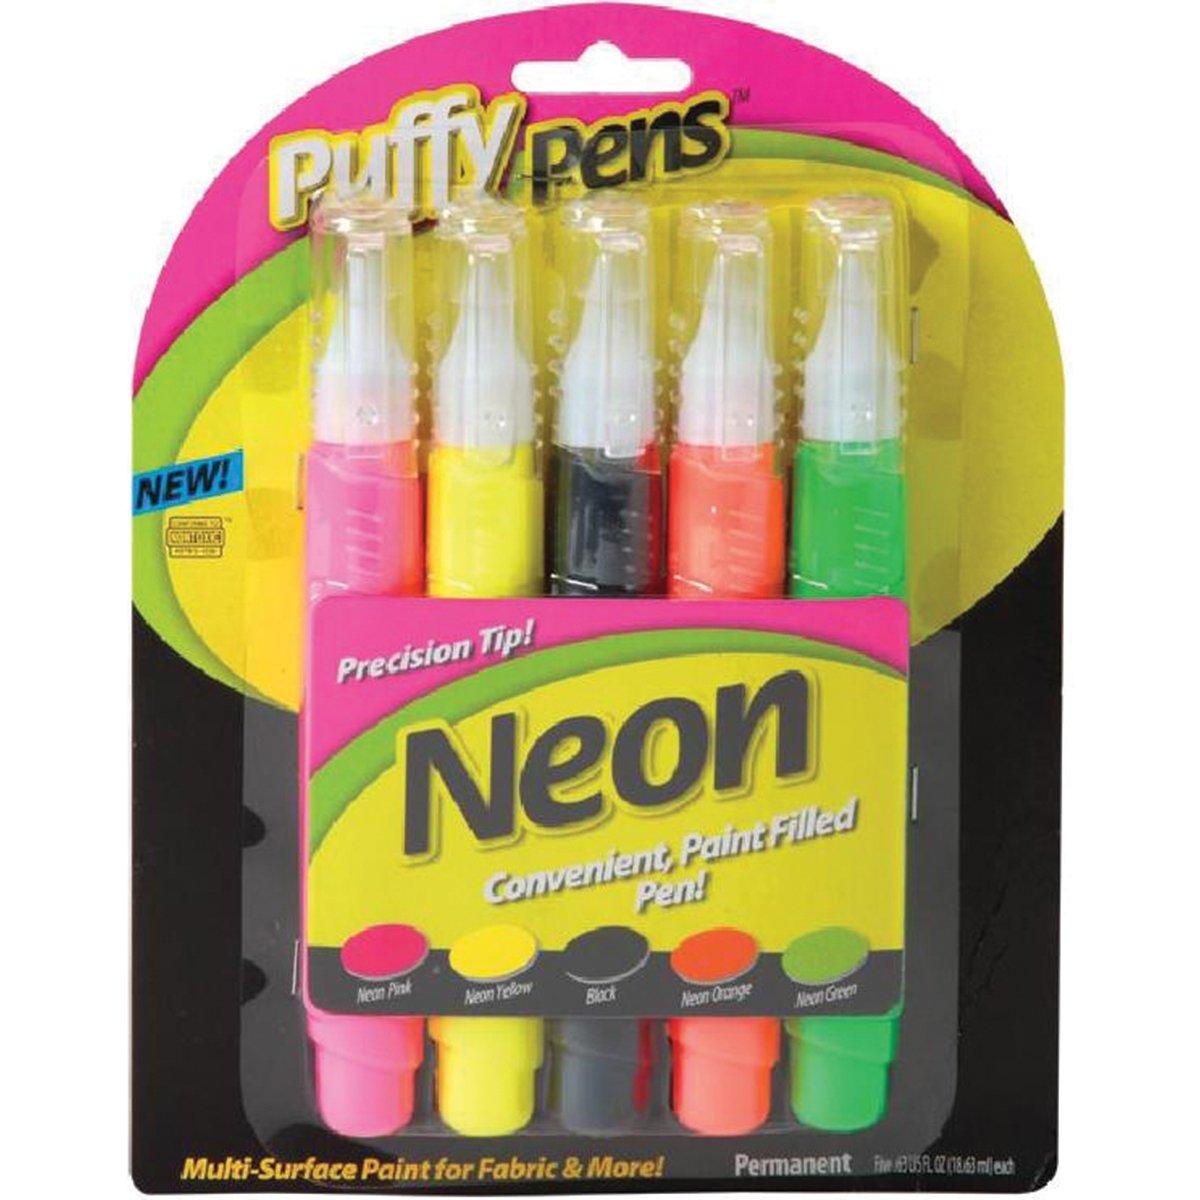 Amazon.com: I Love To Create 26195 5-Piece Puffy Paint Pen Set, Neon ...